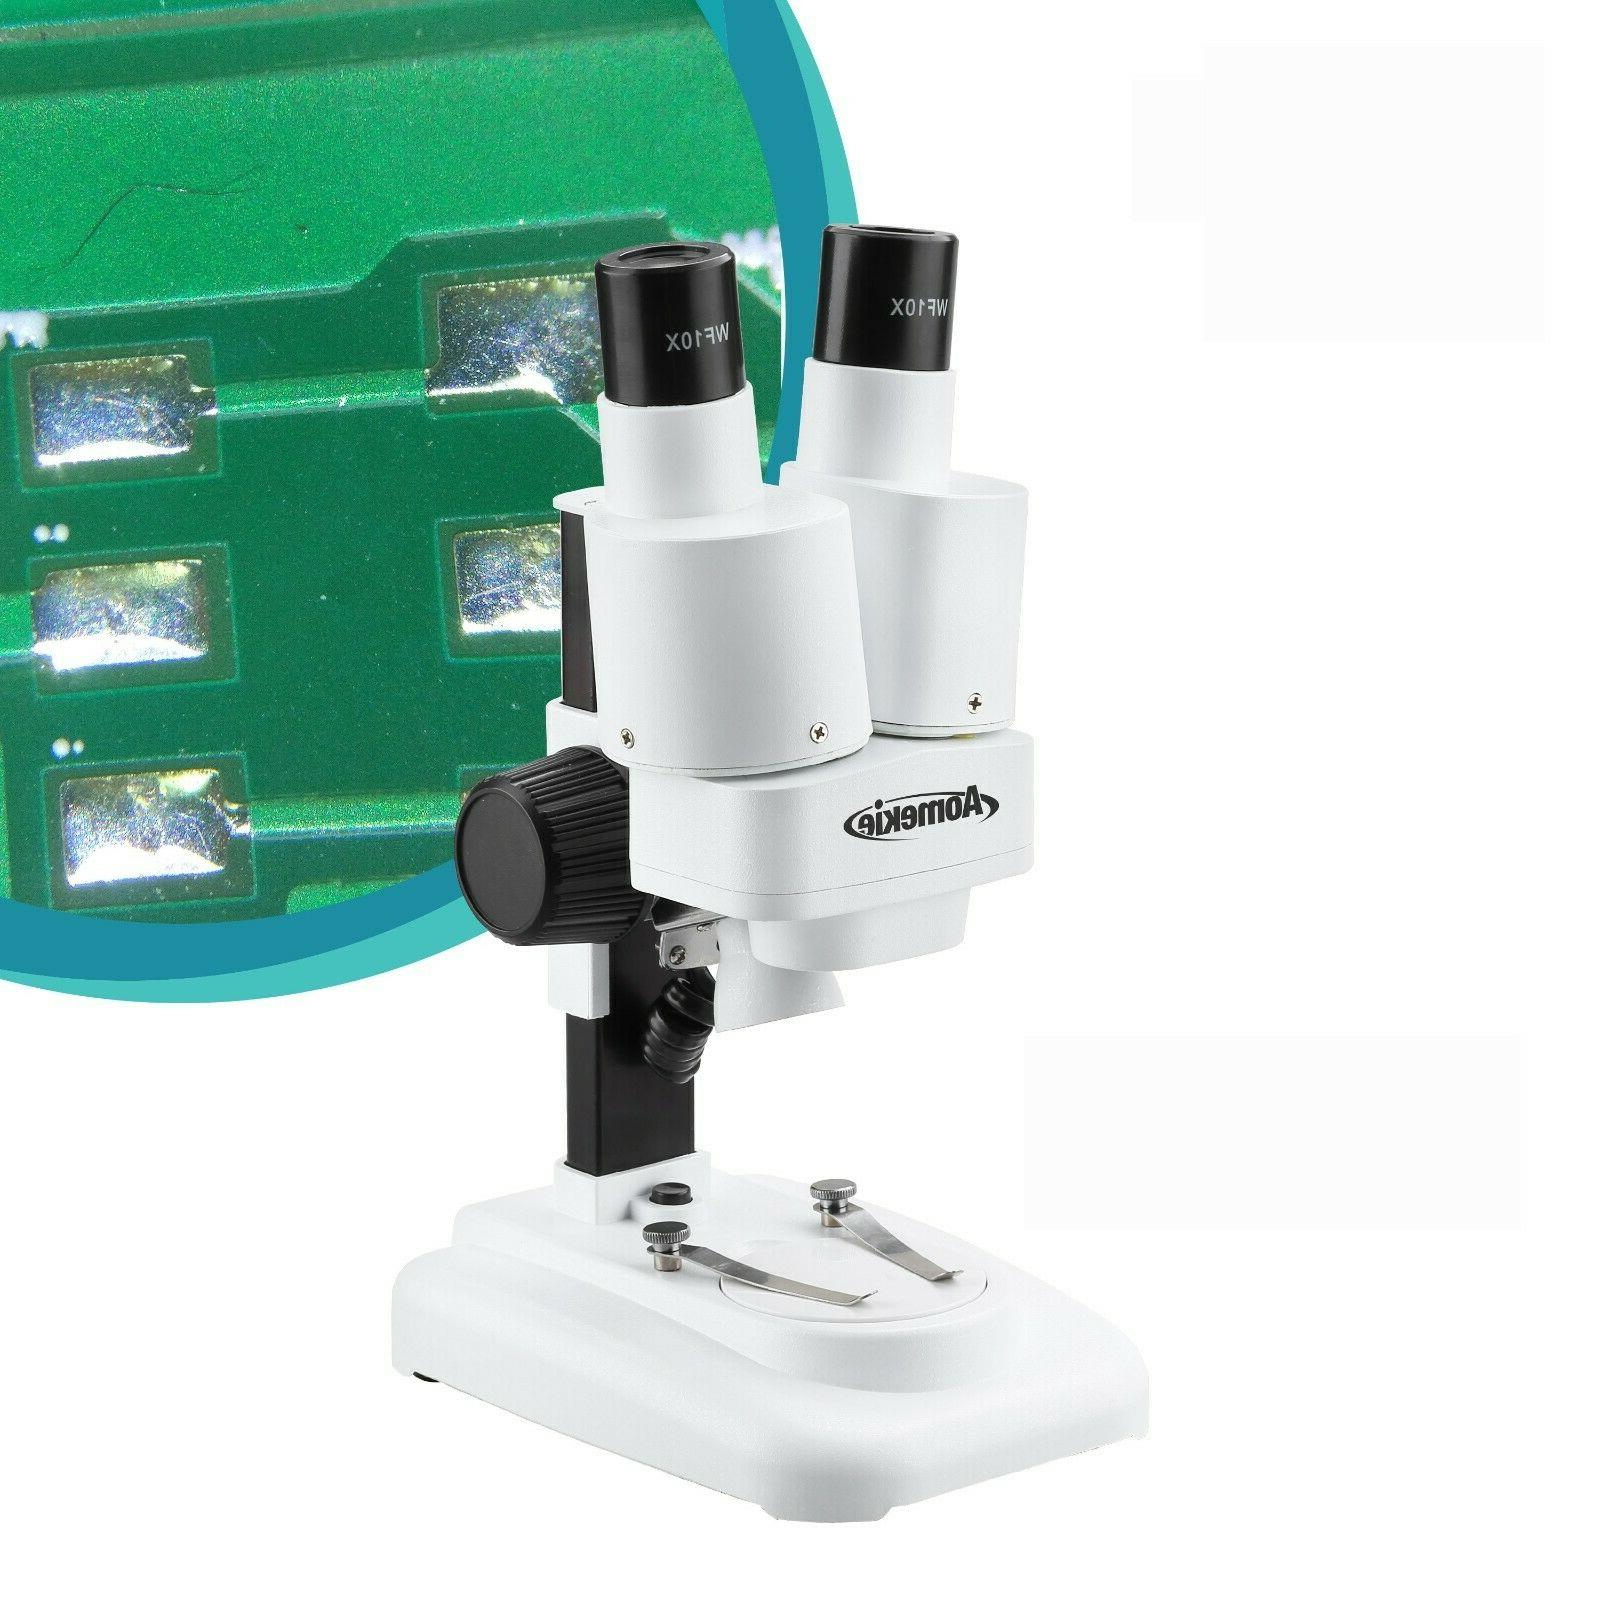 20X Potable Binocular Stereo Microscope LED illumination For